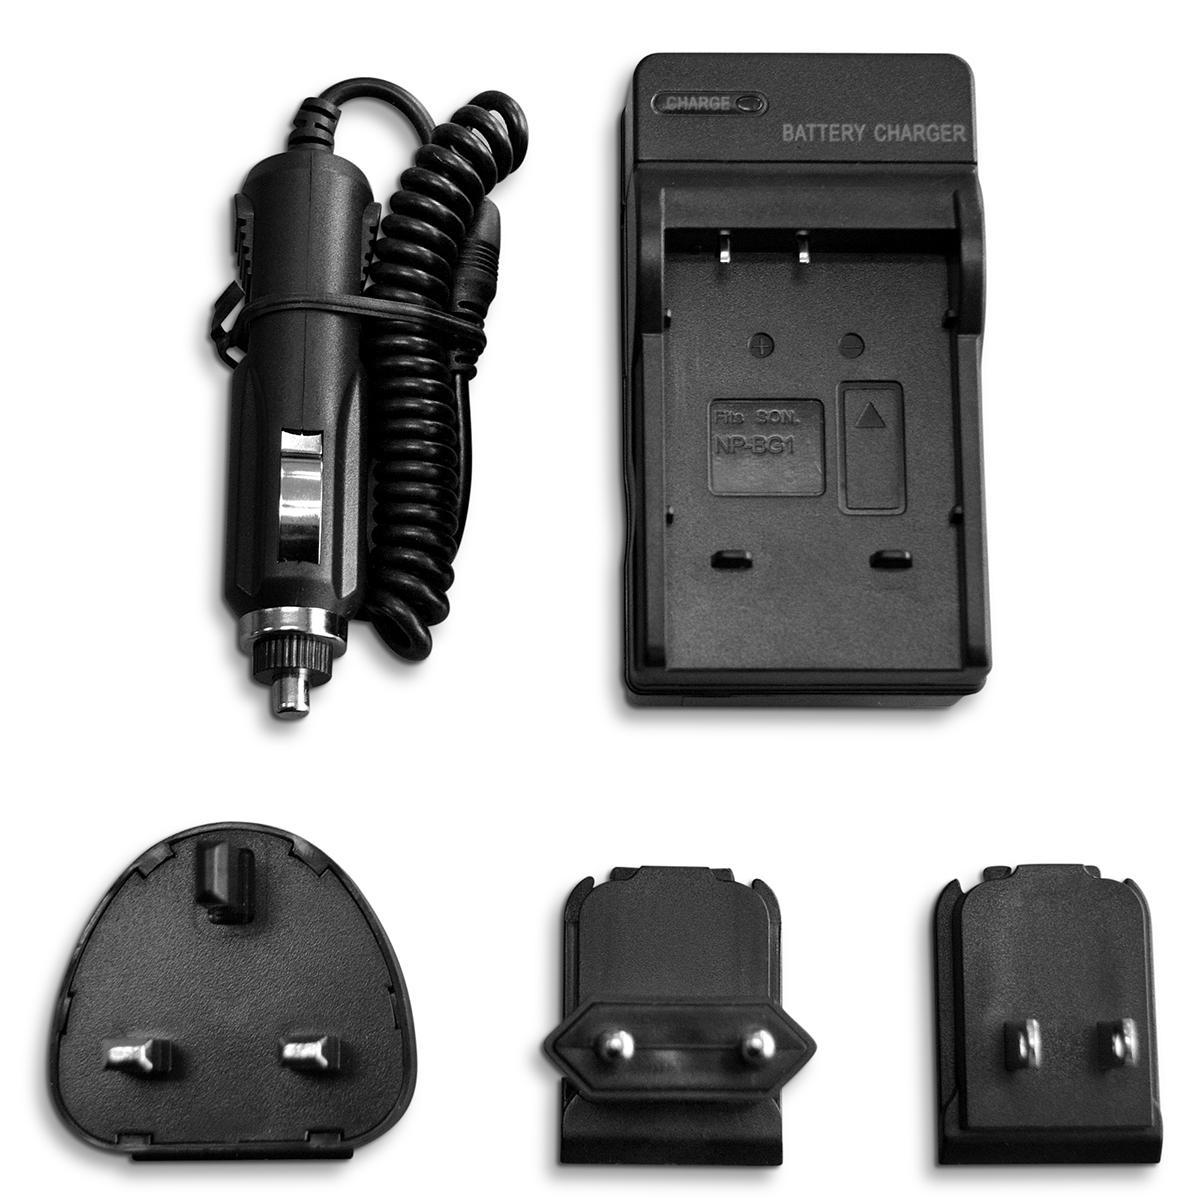 Panasonic lumix dmc fz18 dmc fz38 dmc fz7eg s camera - Batterie panasonic lumix dmc fz18 ...